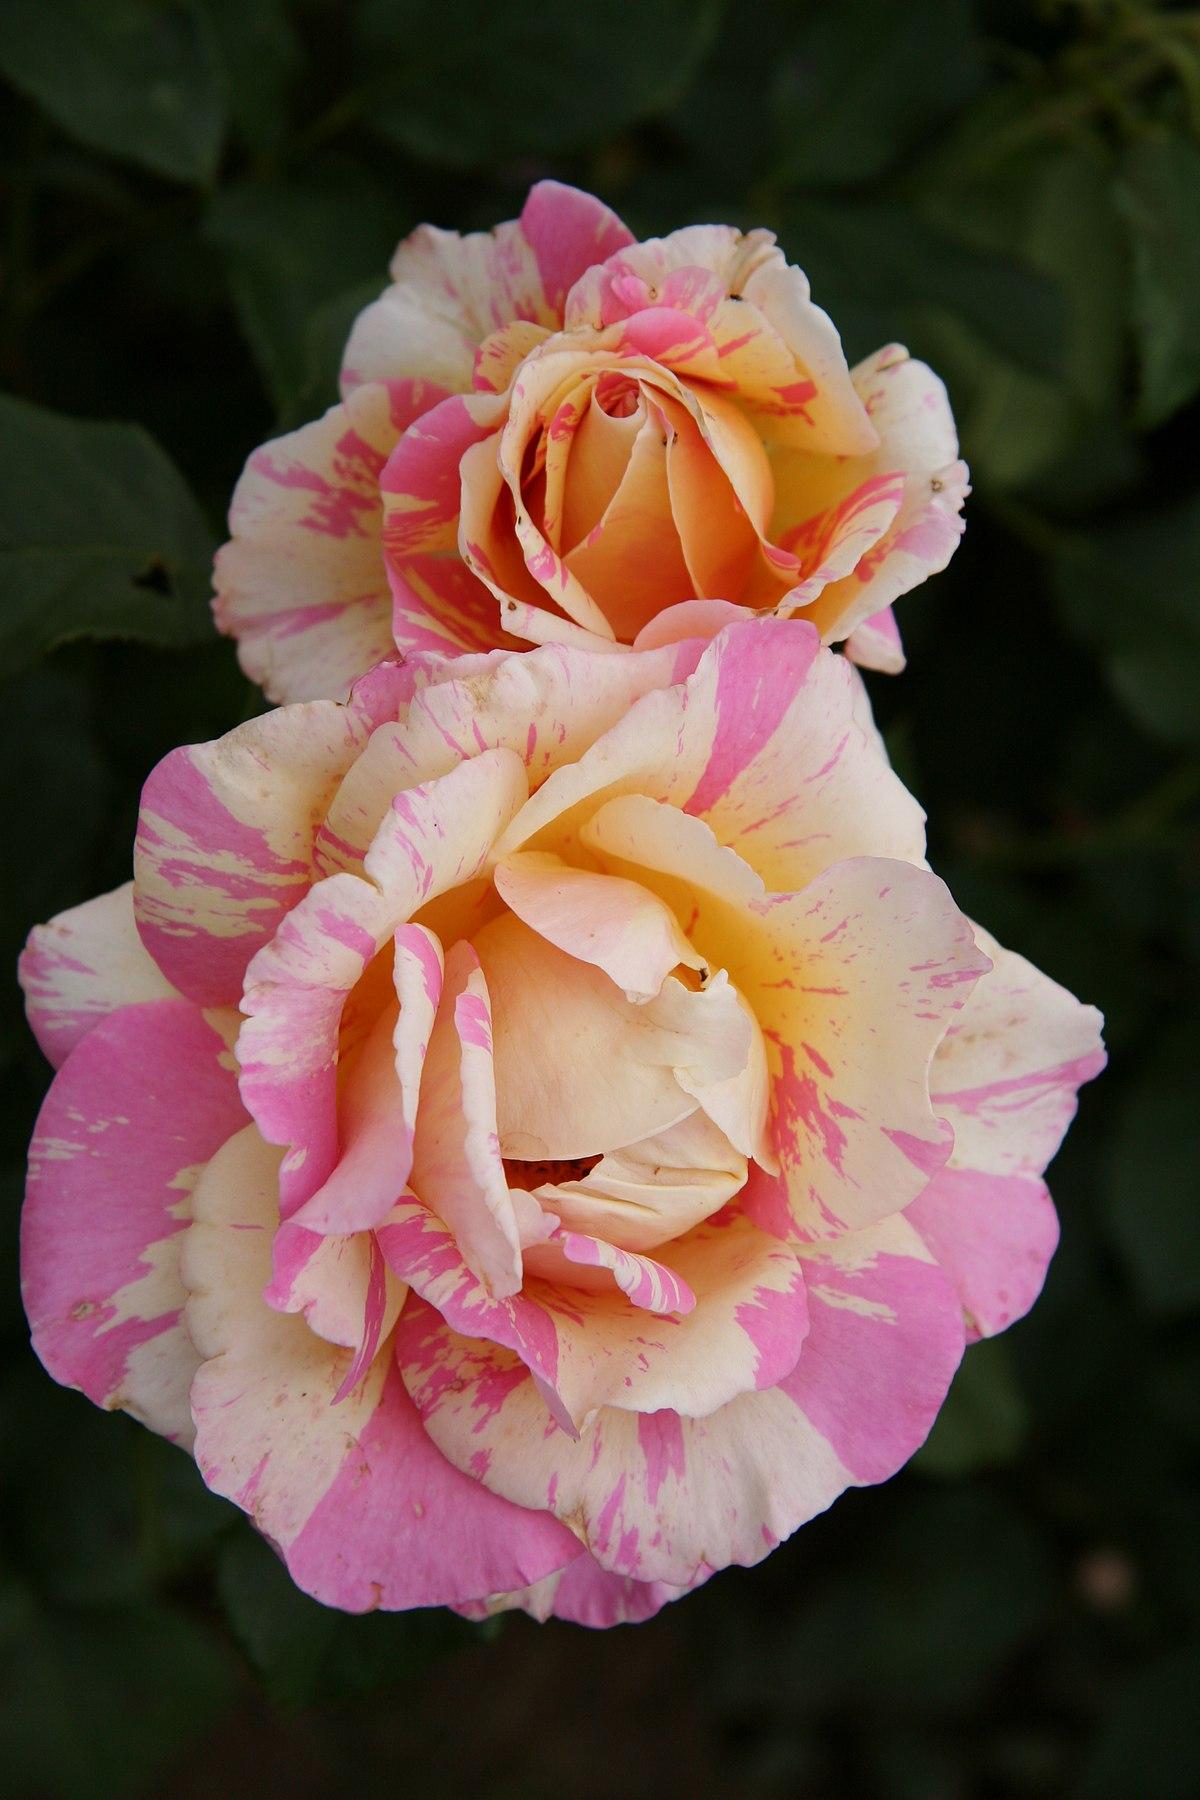 claude monet rose wikipedia